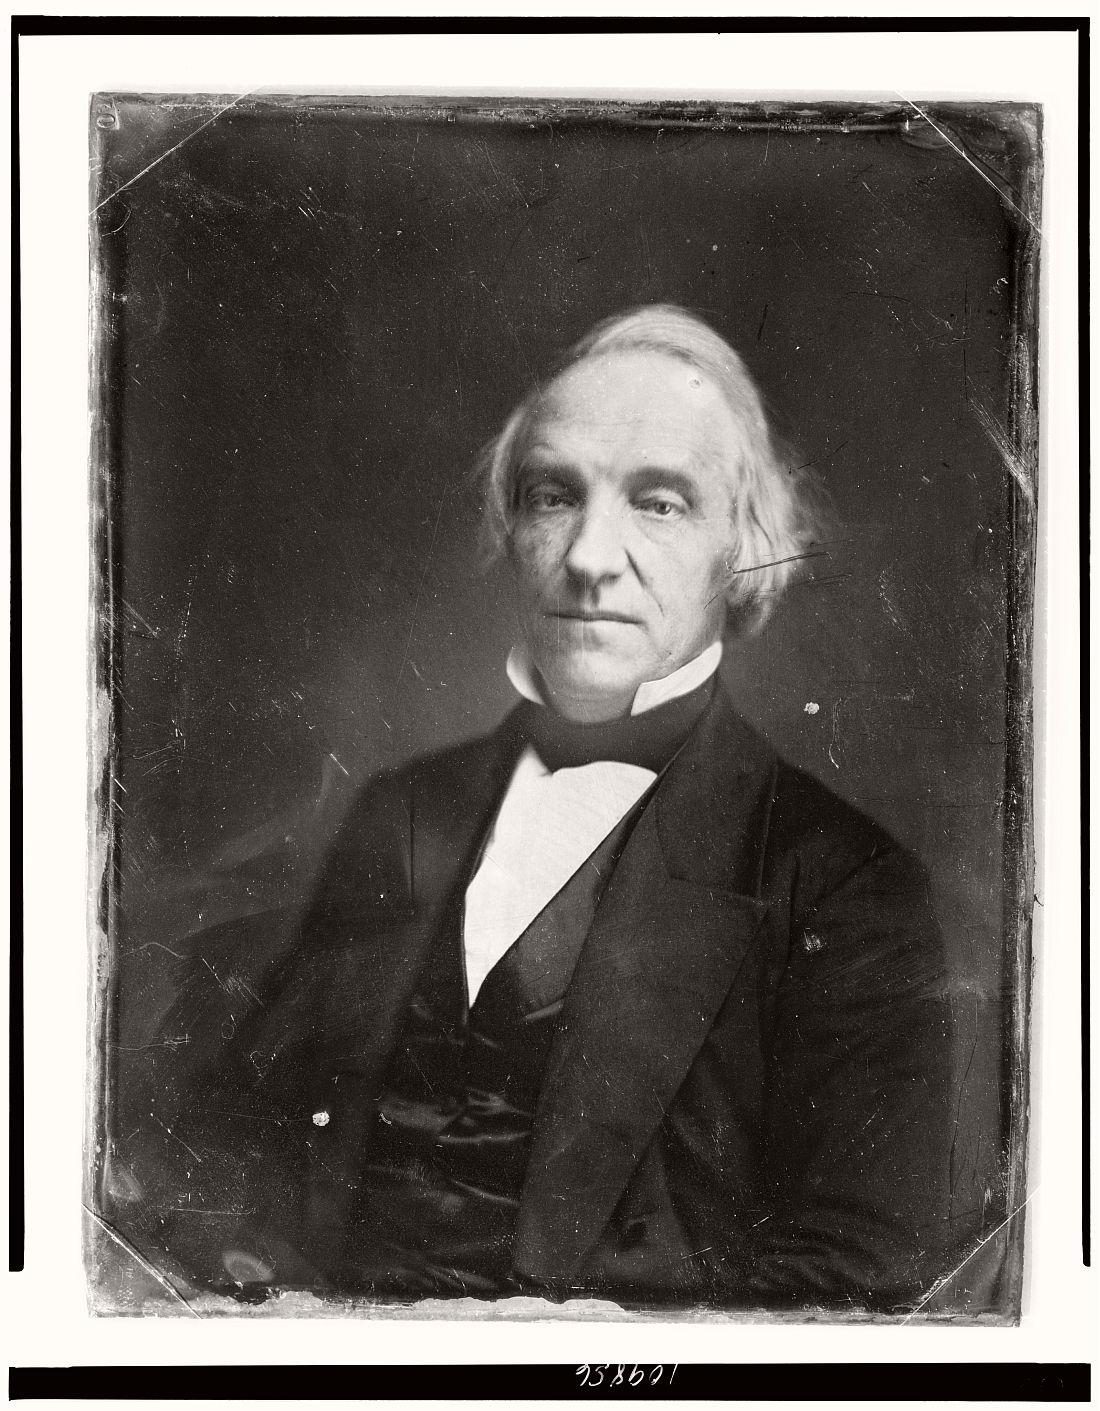 vintage-daguerreotype-portraits-from-xix-century-1844-1860-08